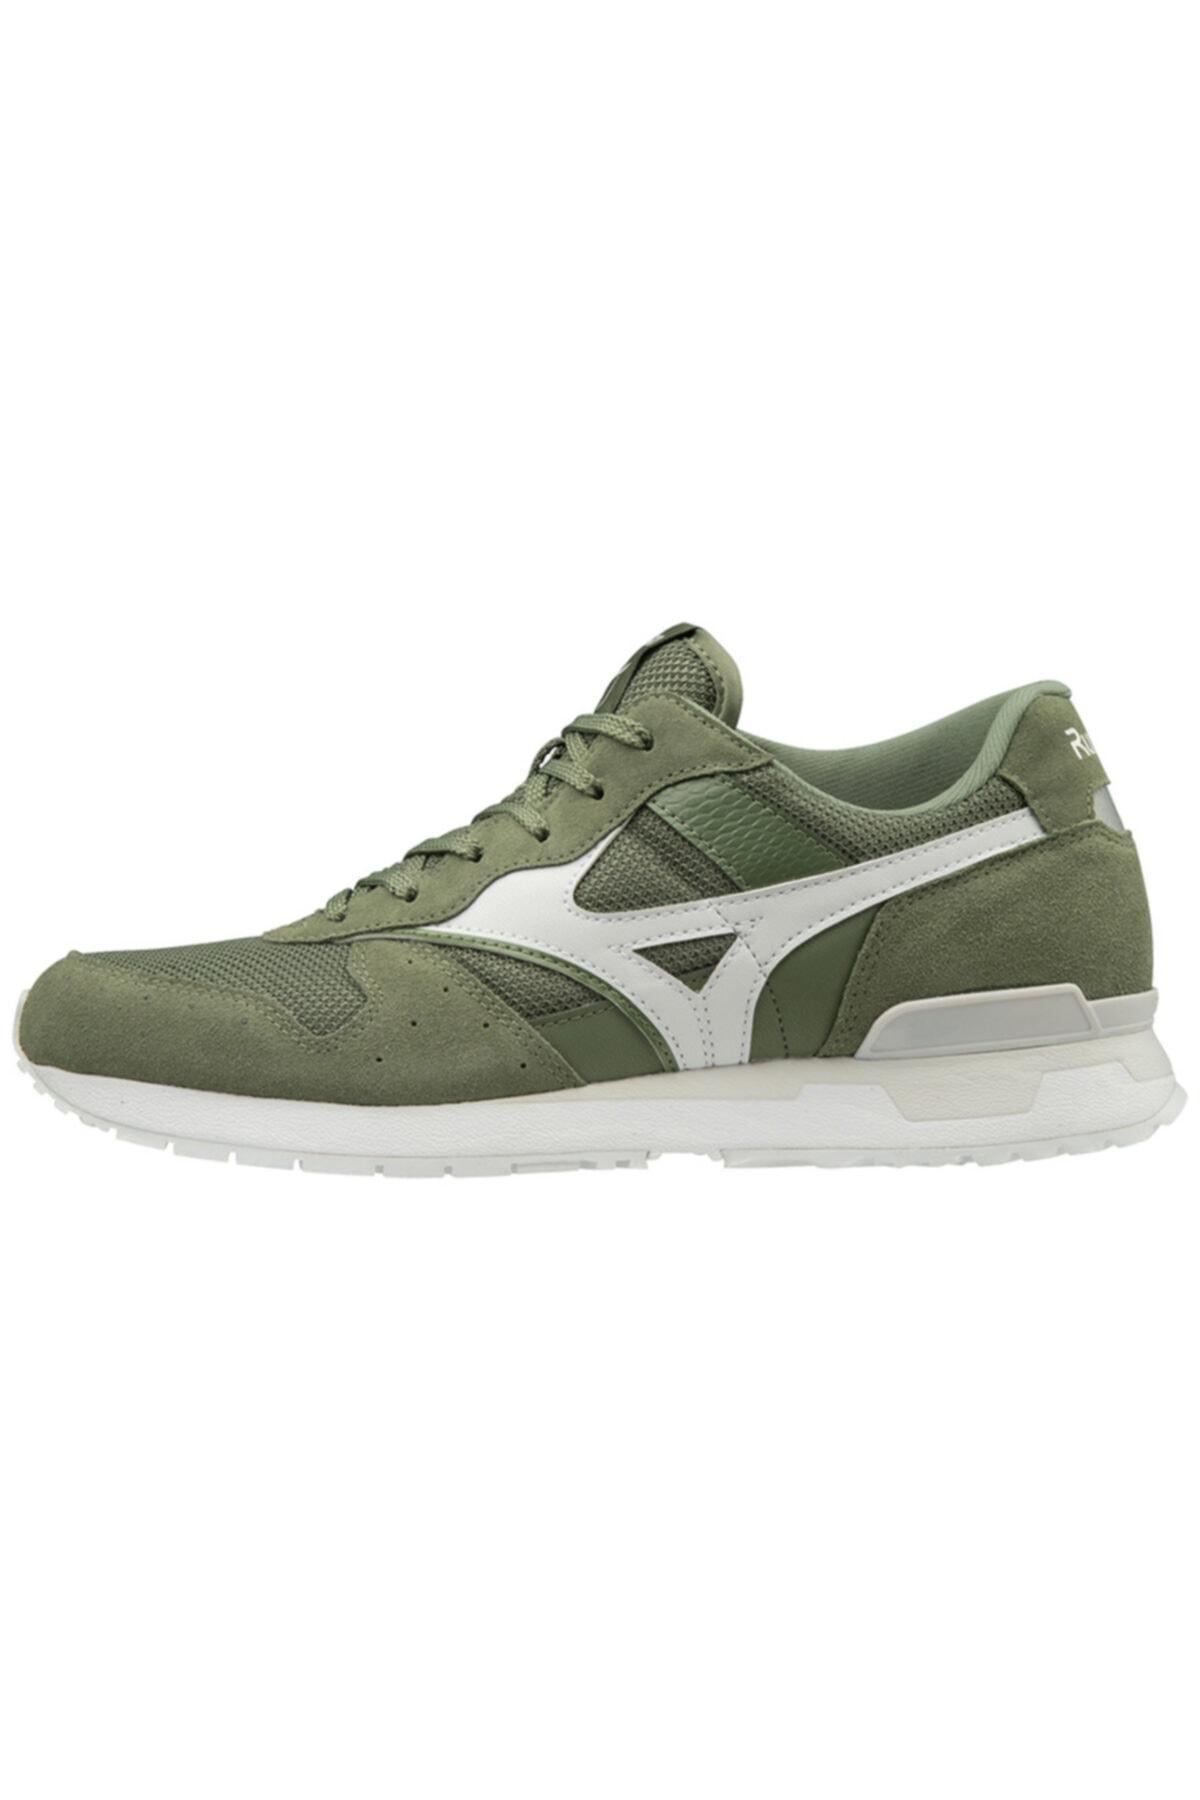 MIZUNO Erkek Sneaker - D1Ga190938 Genova 87 - D1GA190938 1